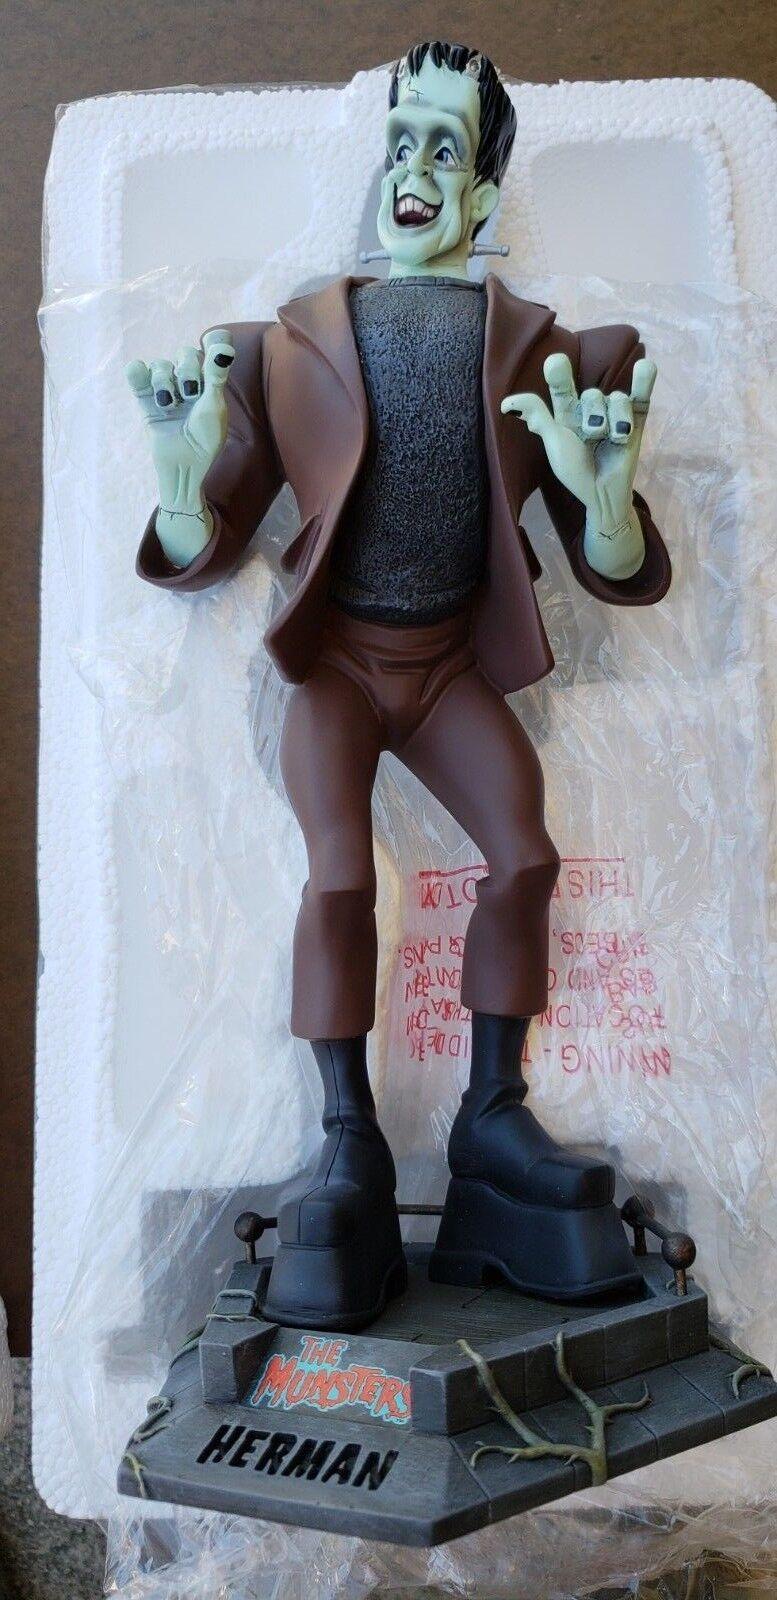 Electric Tiki Tiki Tiki HERMAN MUNSTER maquette bust statue figure ea4